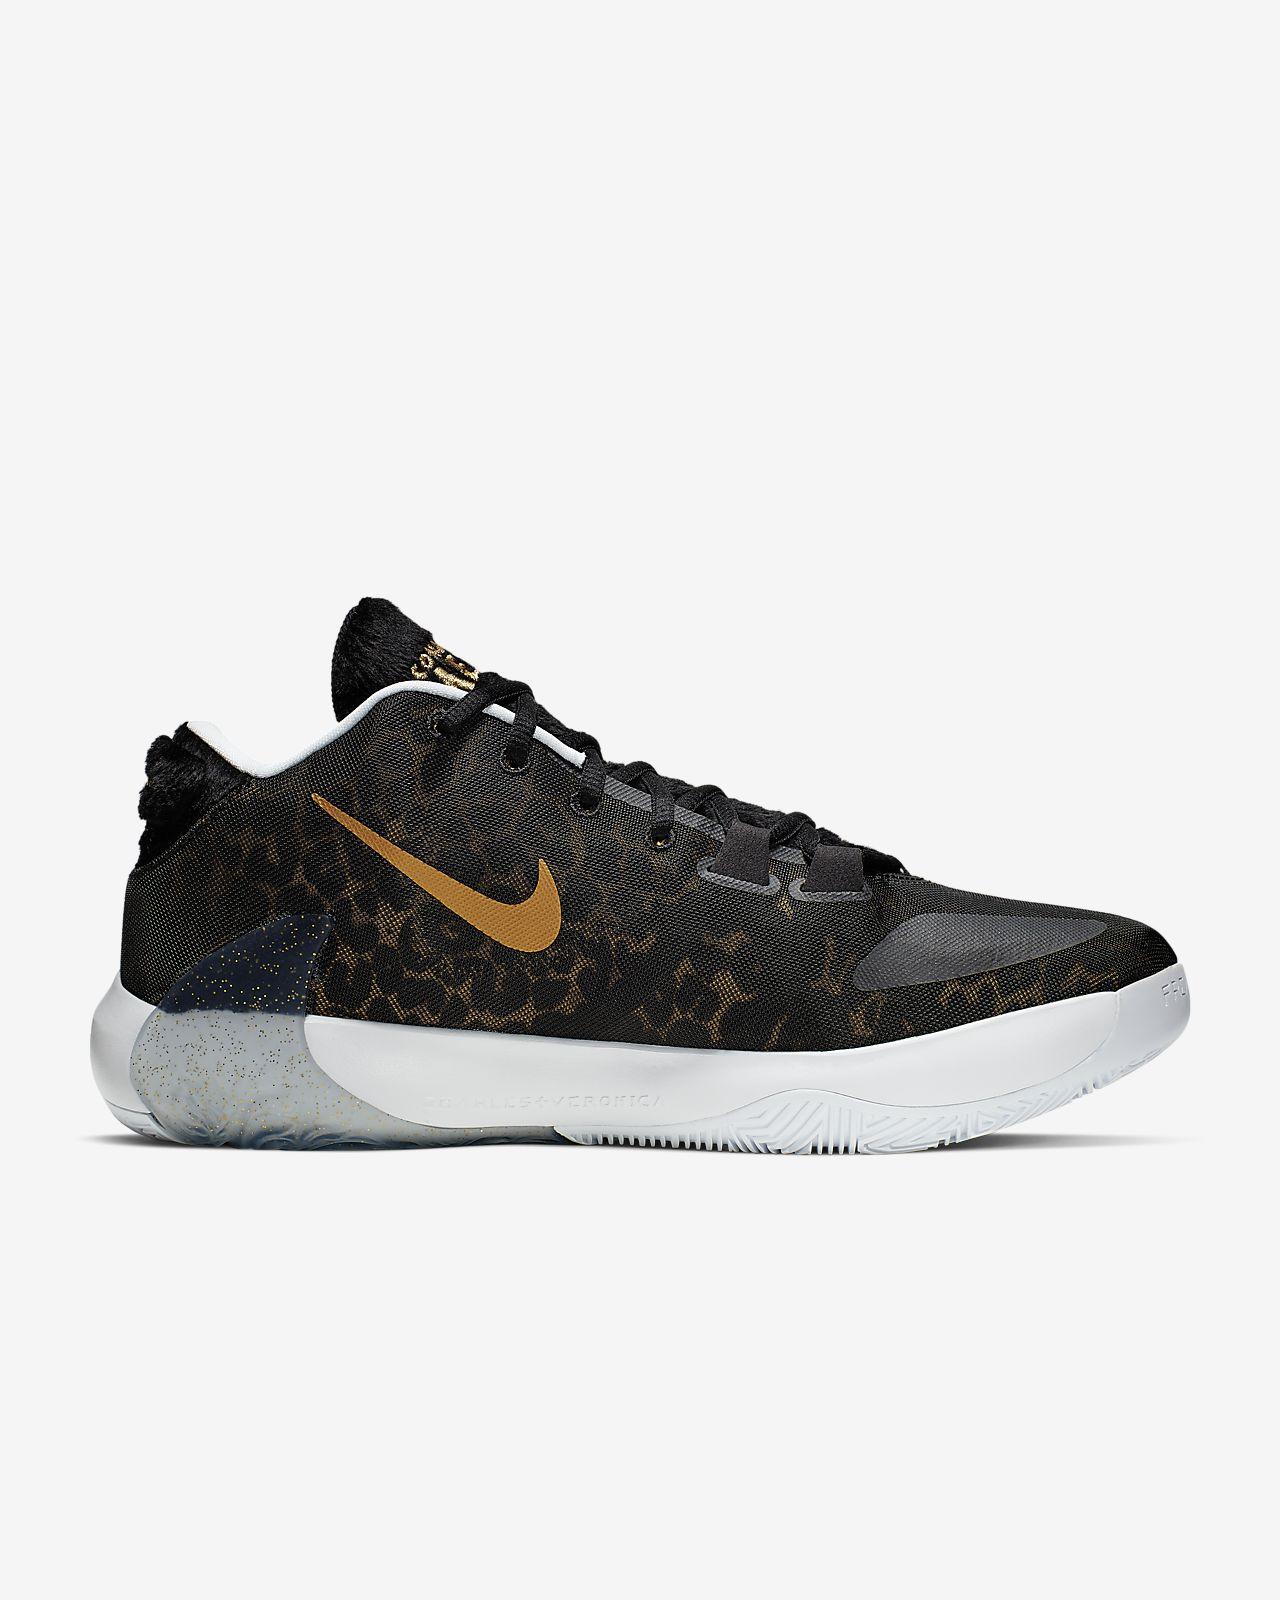 1 To America' Freak Basketball Zoom 'coming Shoe wOPZkTXiul